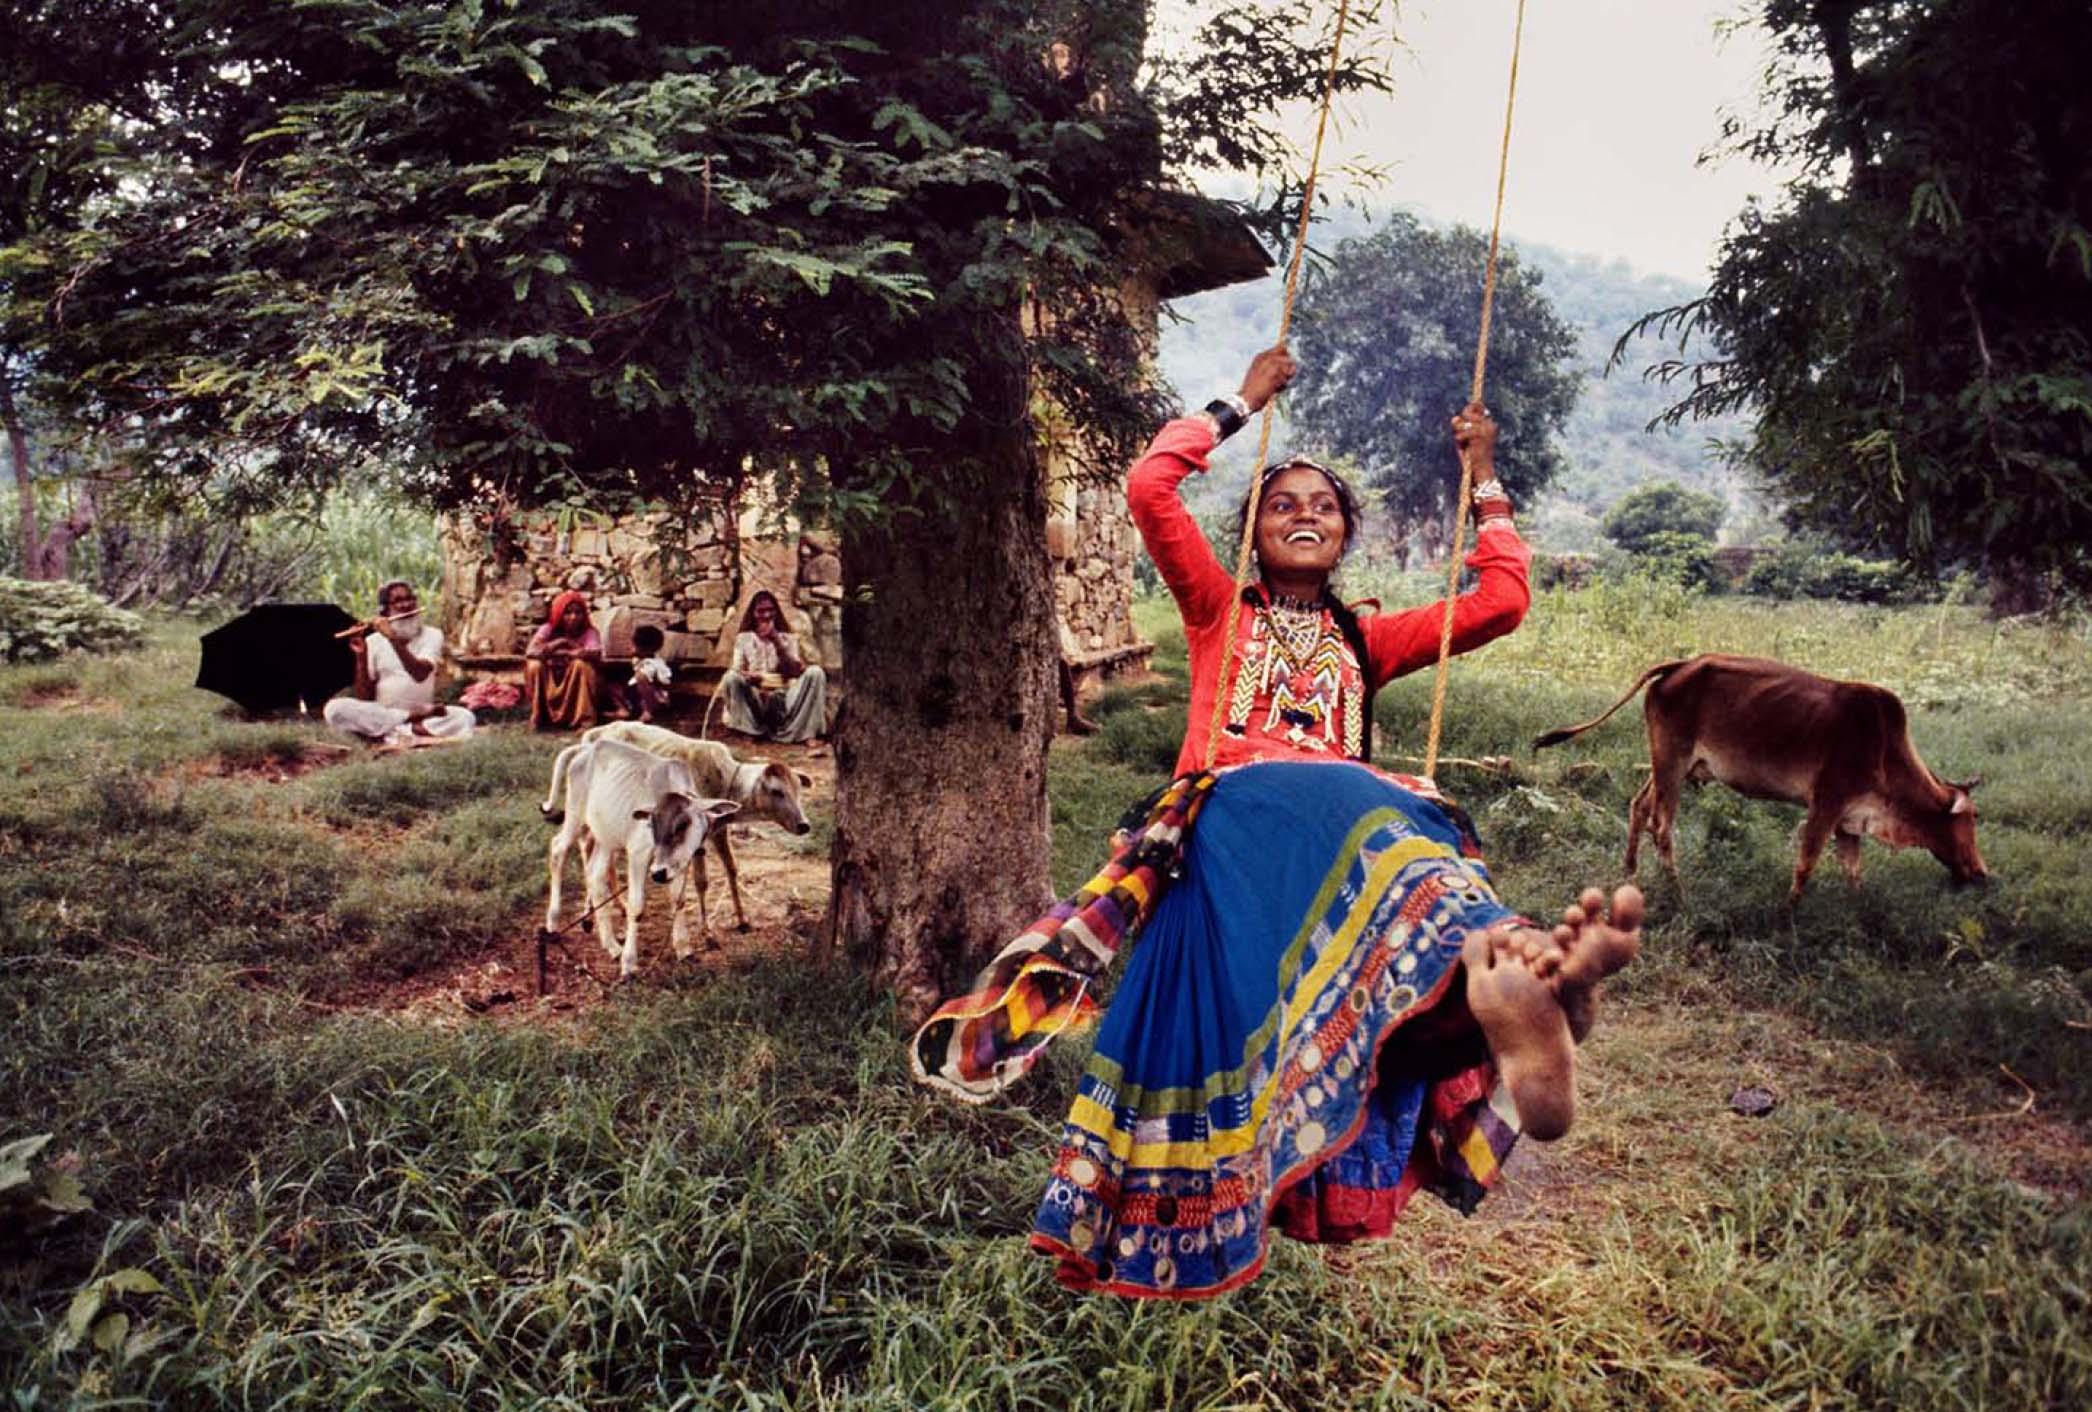 India. © Steve McCurry